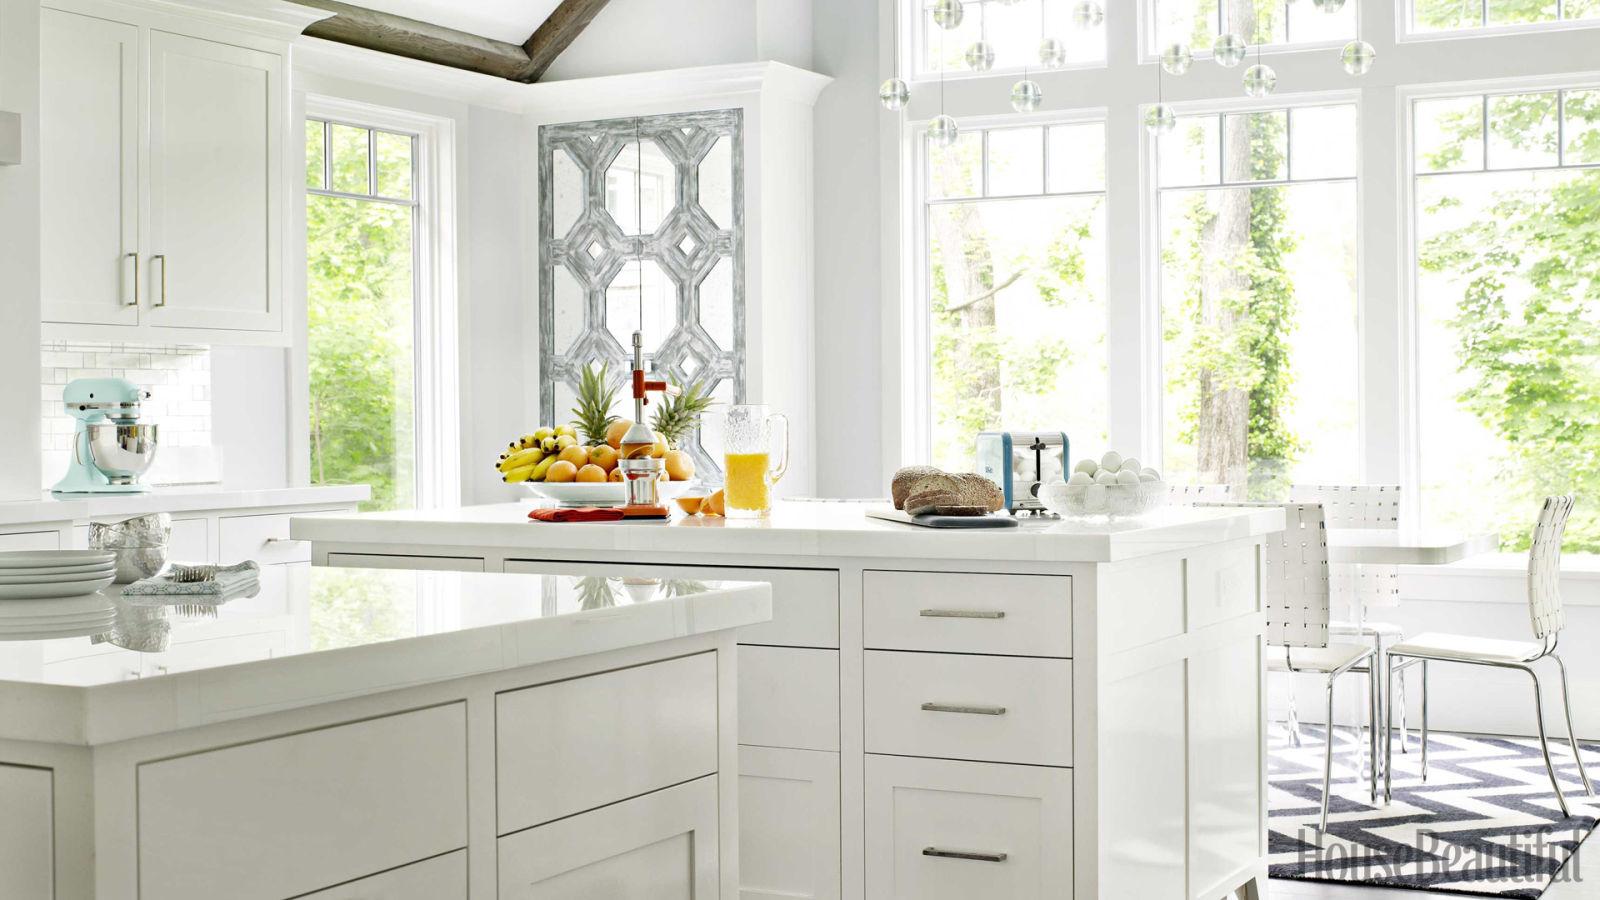 Should I G High Gloss White On Kitchen Cabinets